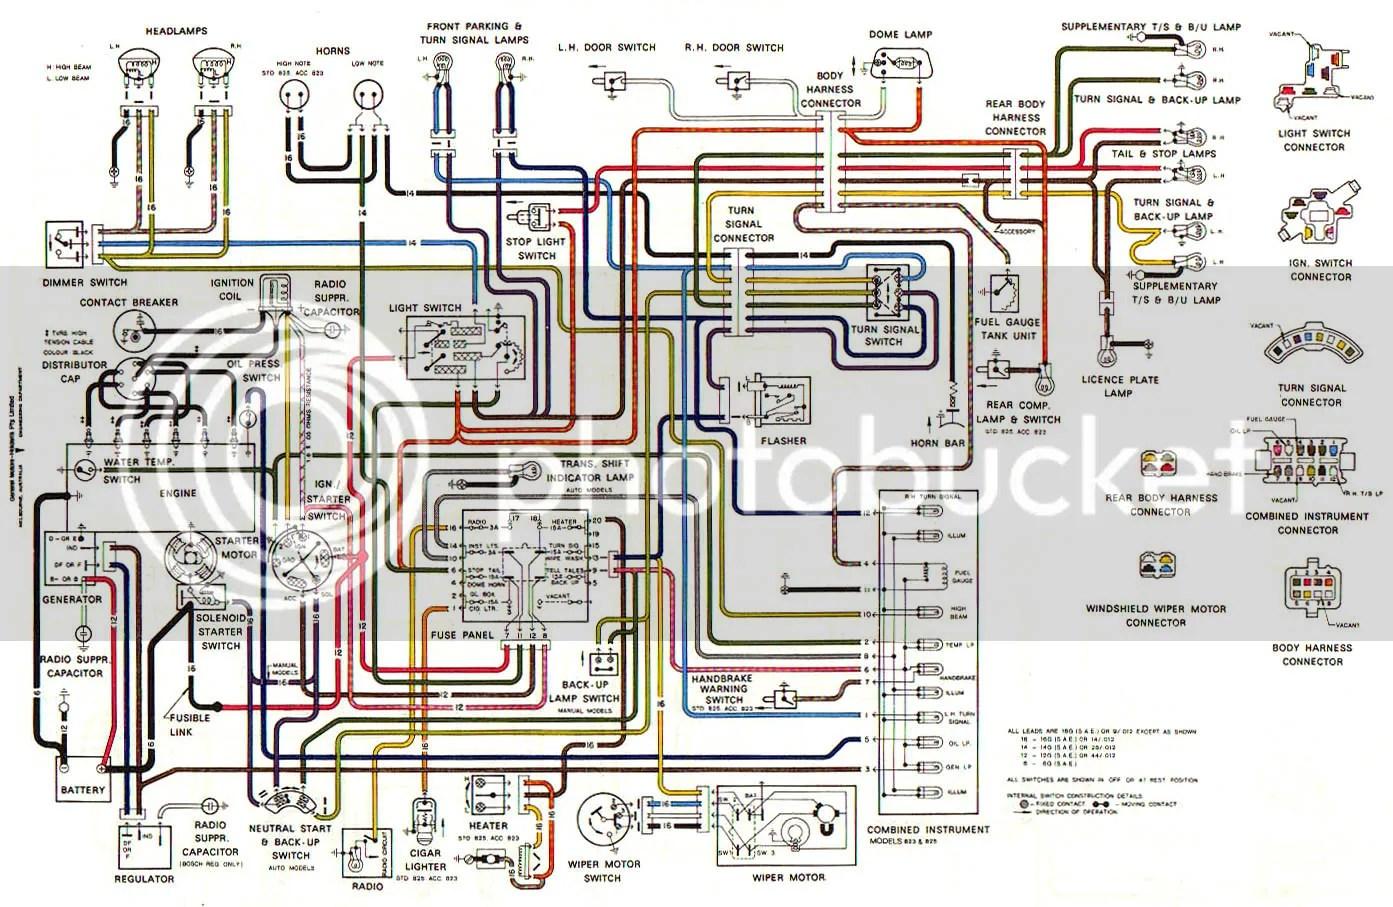 hight resolution of hq wiper motor wiring diagram wiring librarylj torana wiper motor wiring diagram lc gtr dash general